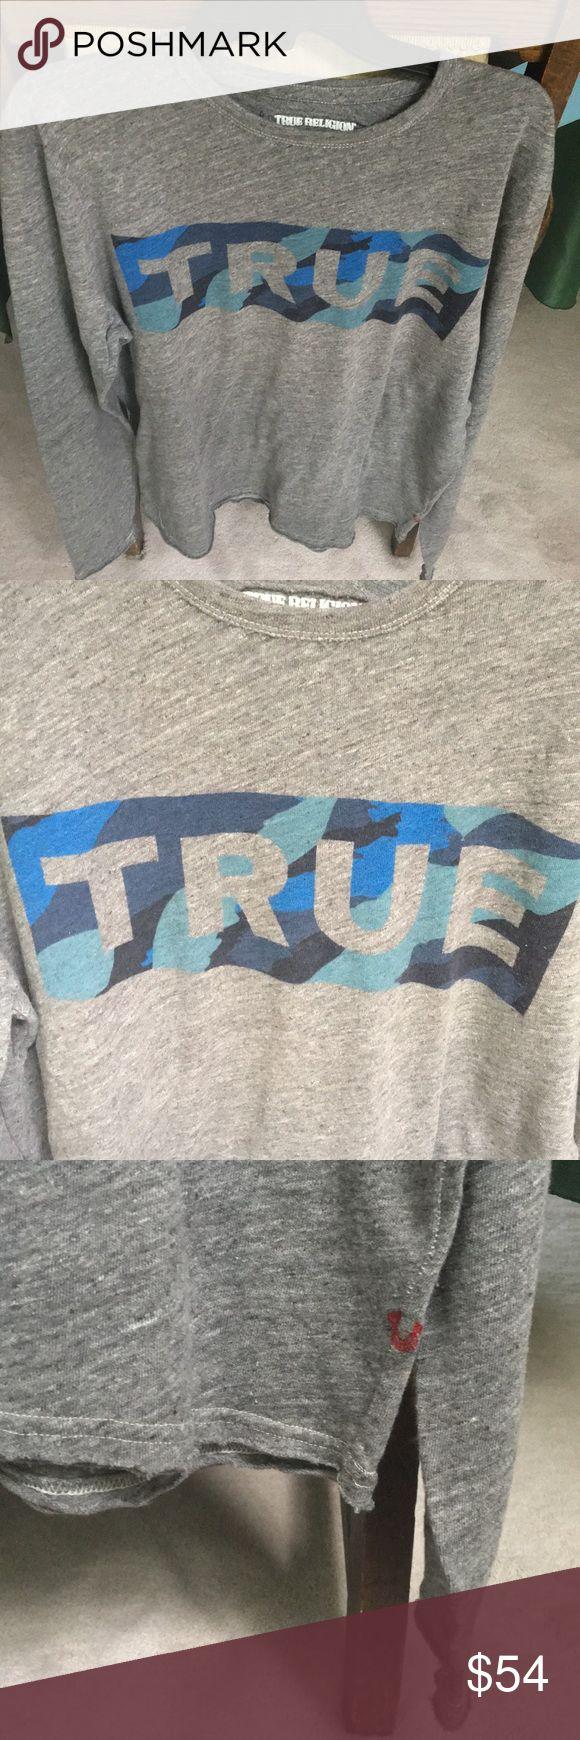 NWT True Religion True camo artwork LS NWT True Religion True camo artwork LS. Color: gray marl. Style M17ST30F1G. Size XL. Made in Turkey. 100% cotton. Happy poshing☺️👍 True Religion Shirts Tees - Long Sleeve